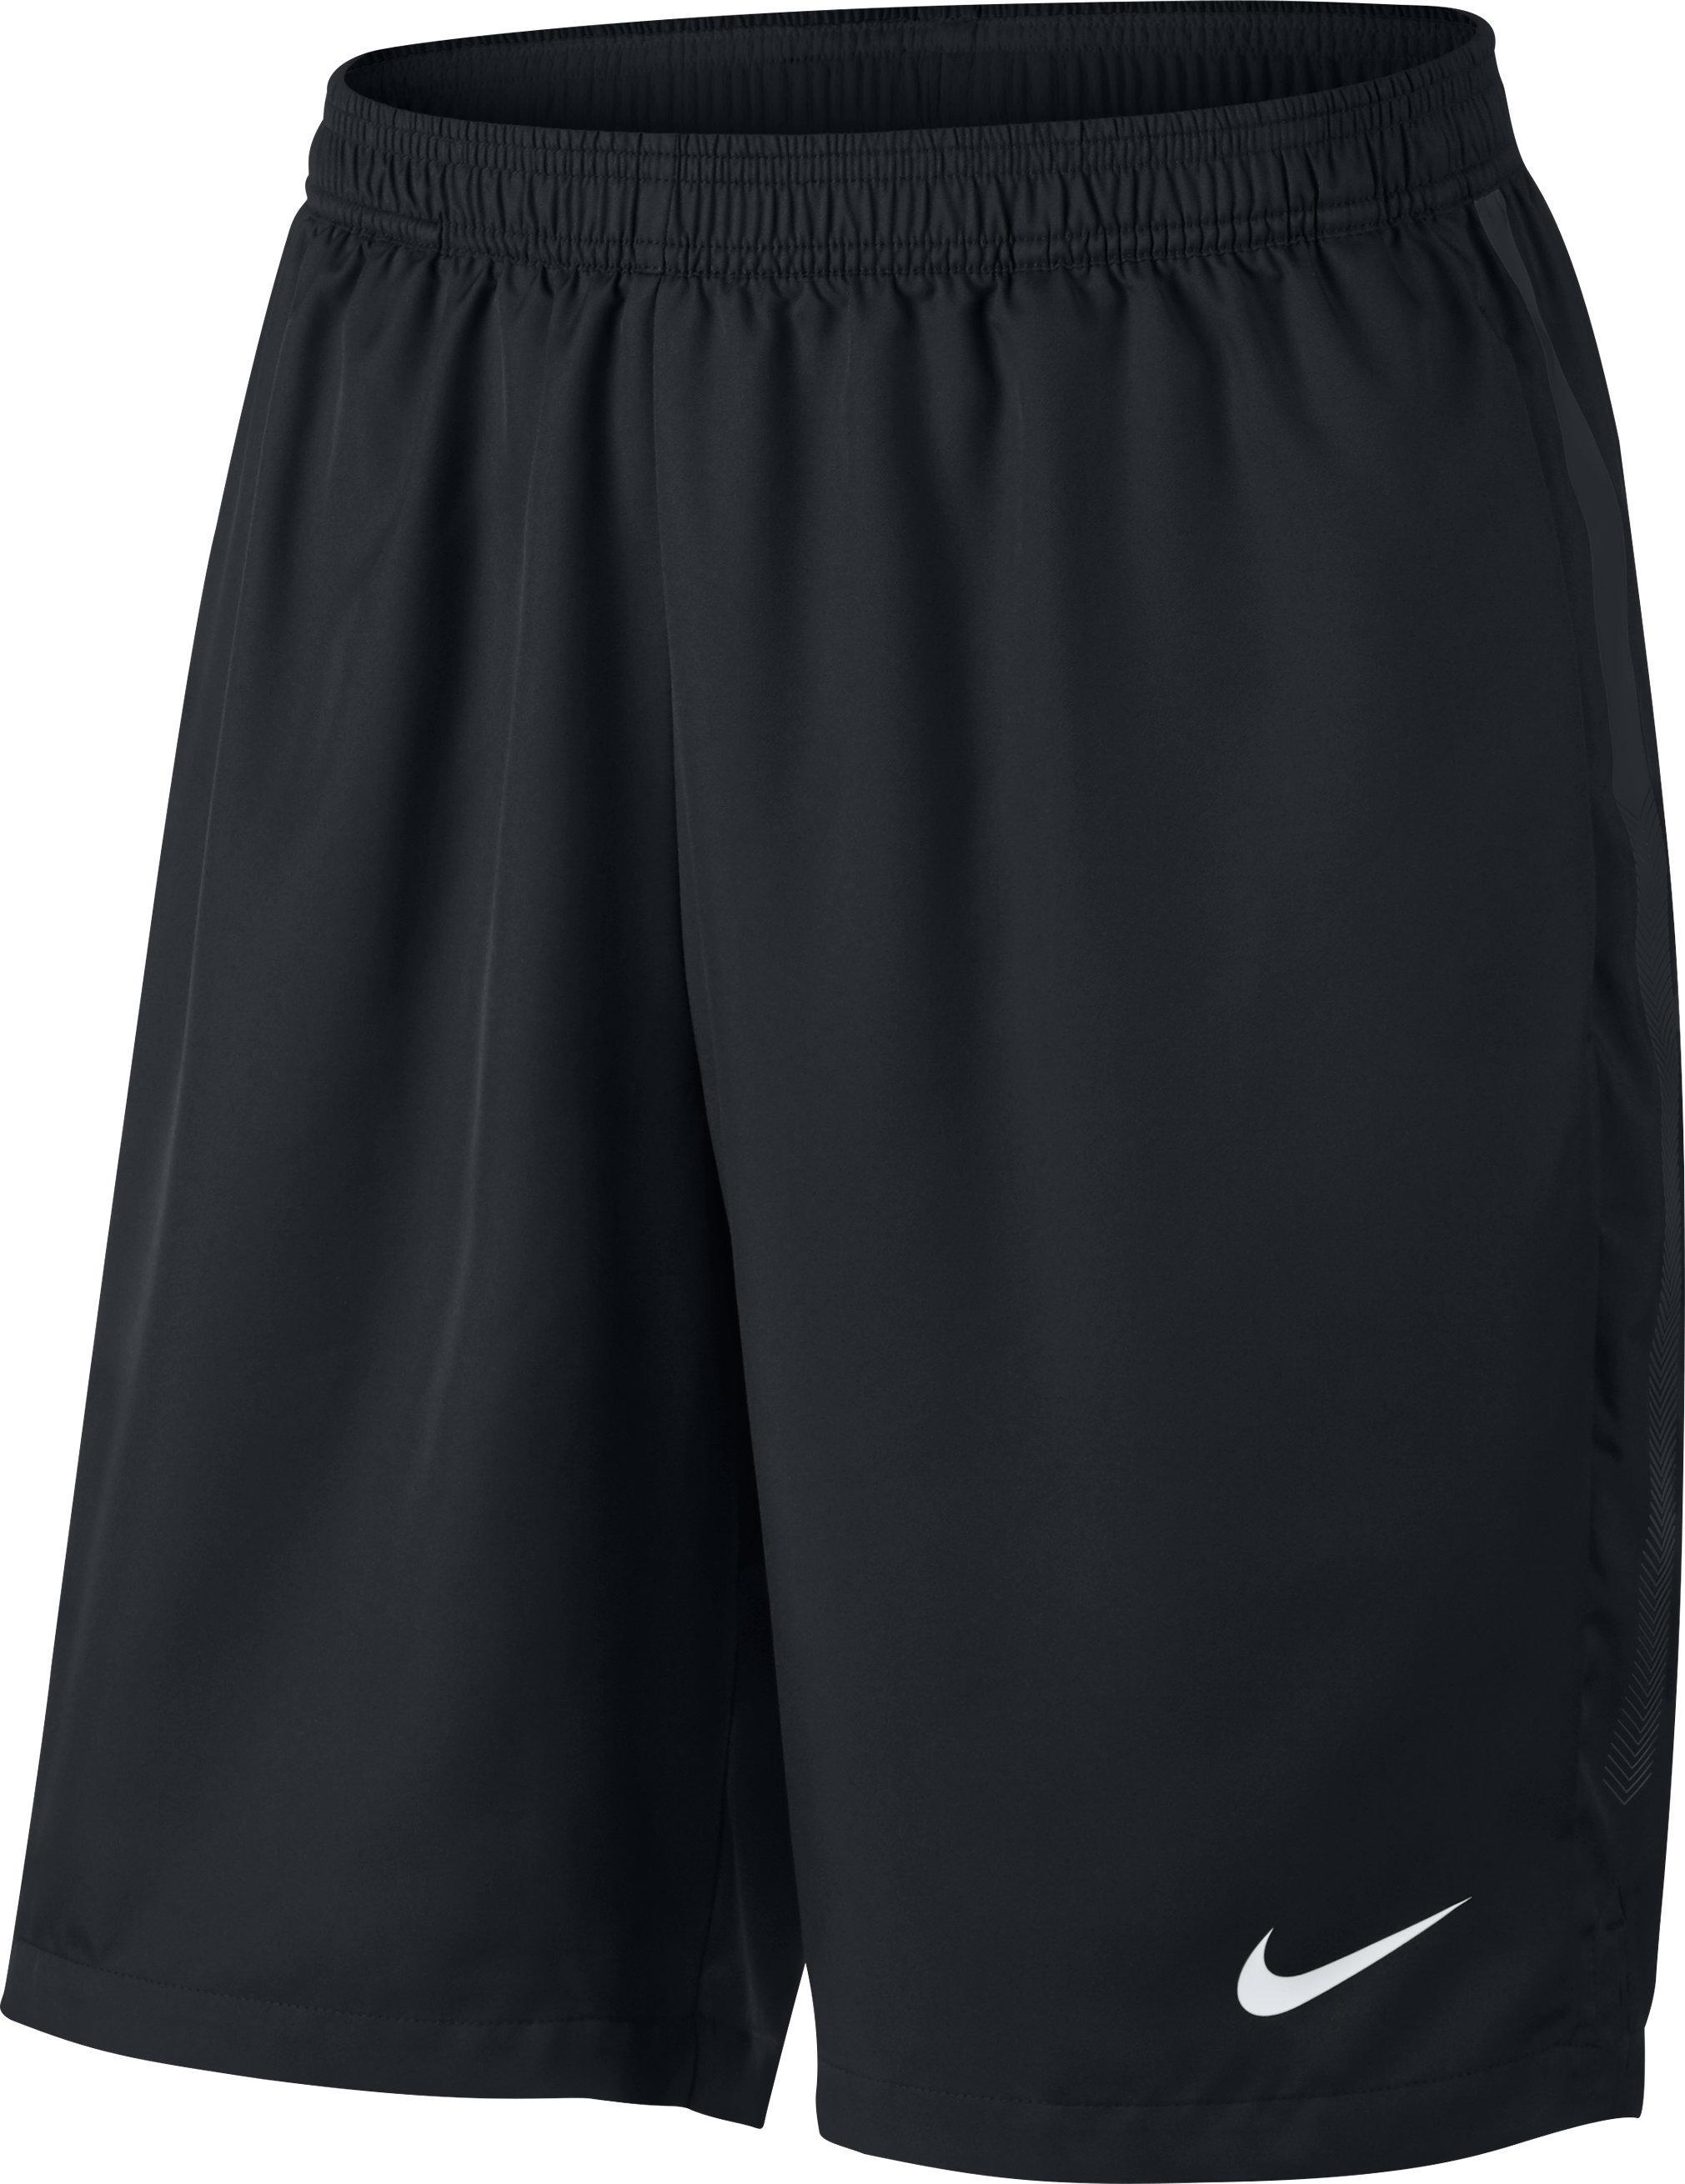 Nike Tennisshort Nike Dry zwart